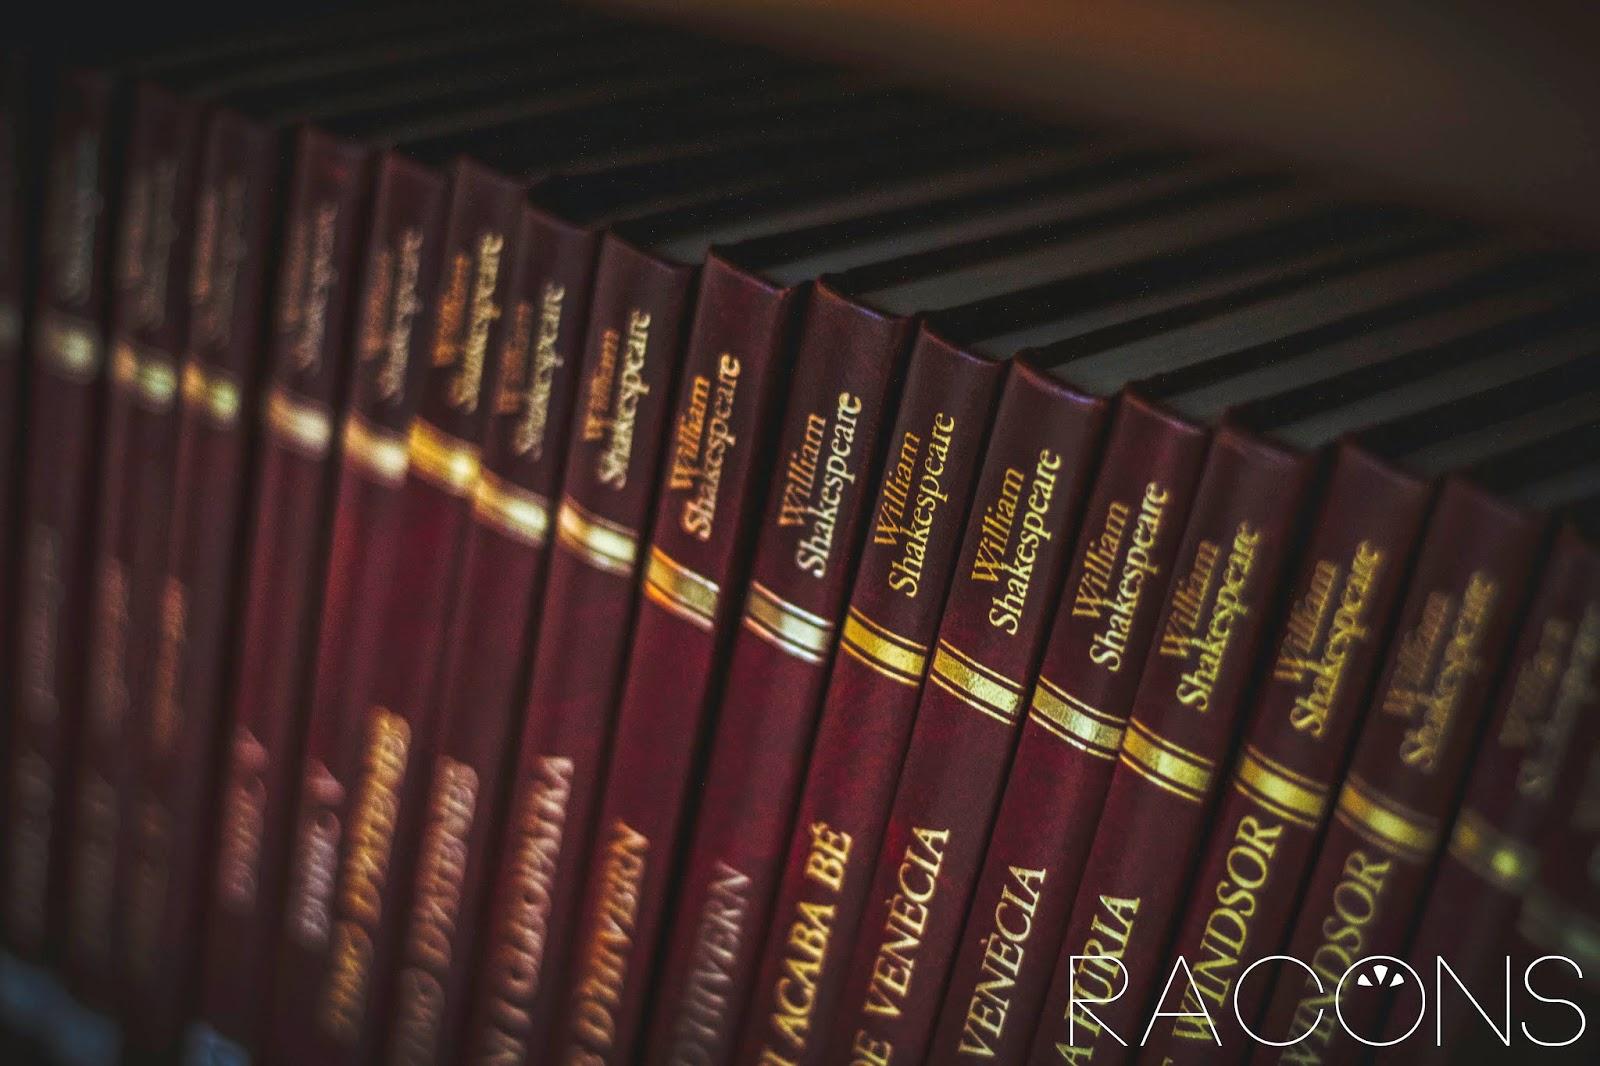 llibres biblioteca galliner - shakespeare